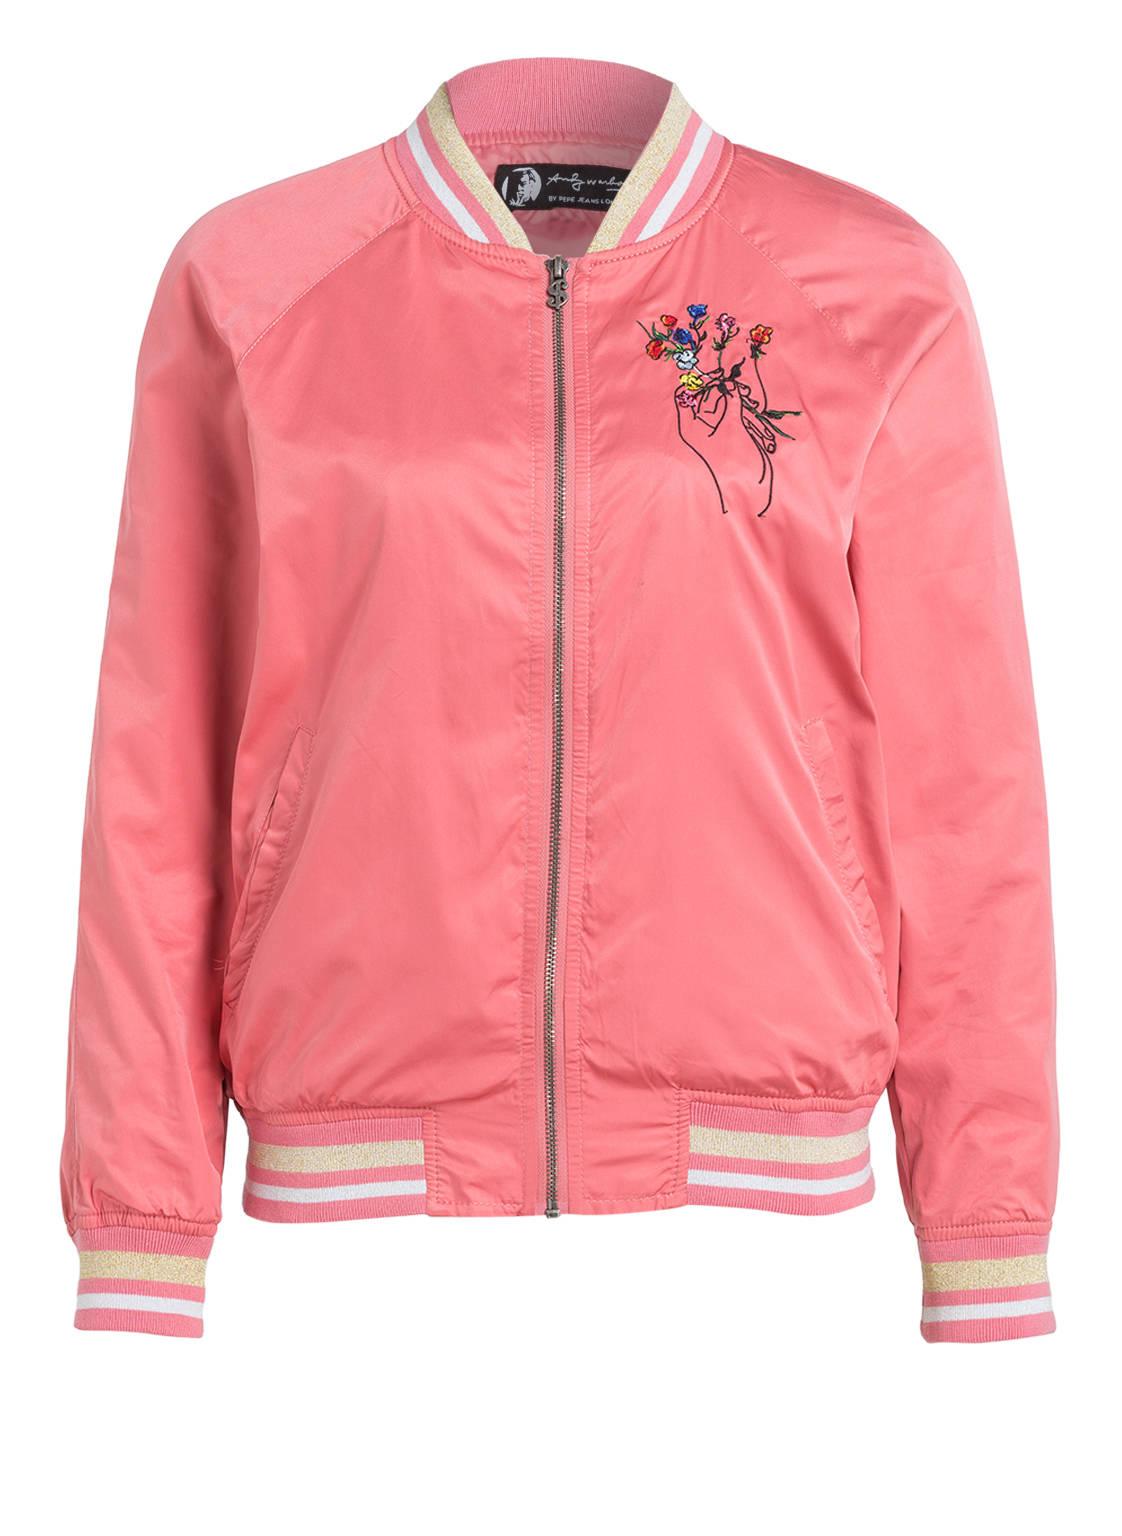 Bomberjacke damen pink